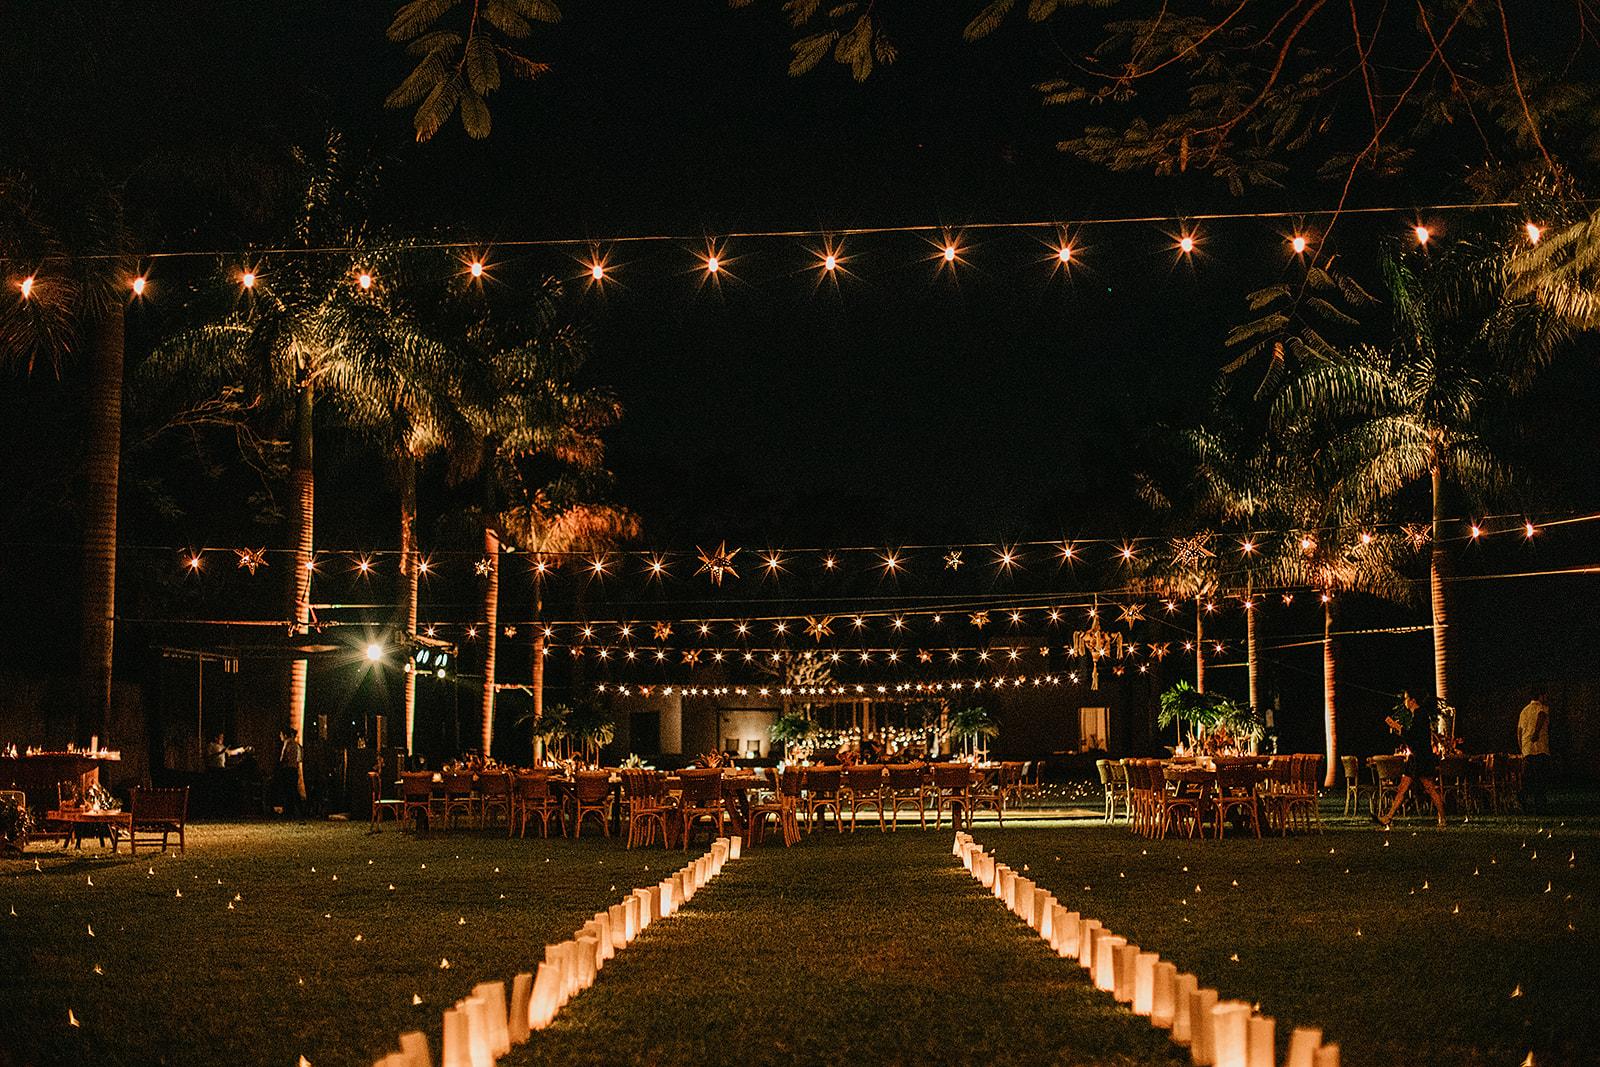 AmandaMarkus-Hacienda-Sac-Chich-Merida-Wedding-666_websize.jpg